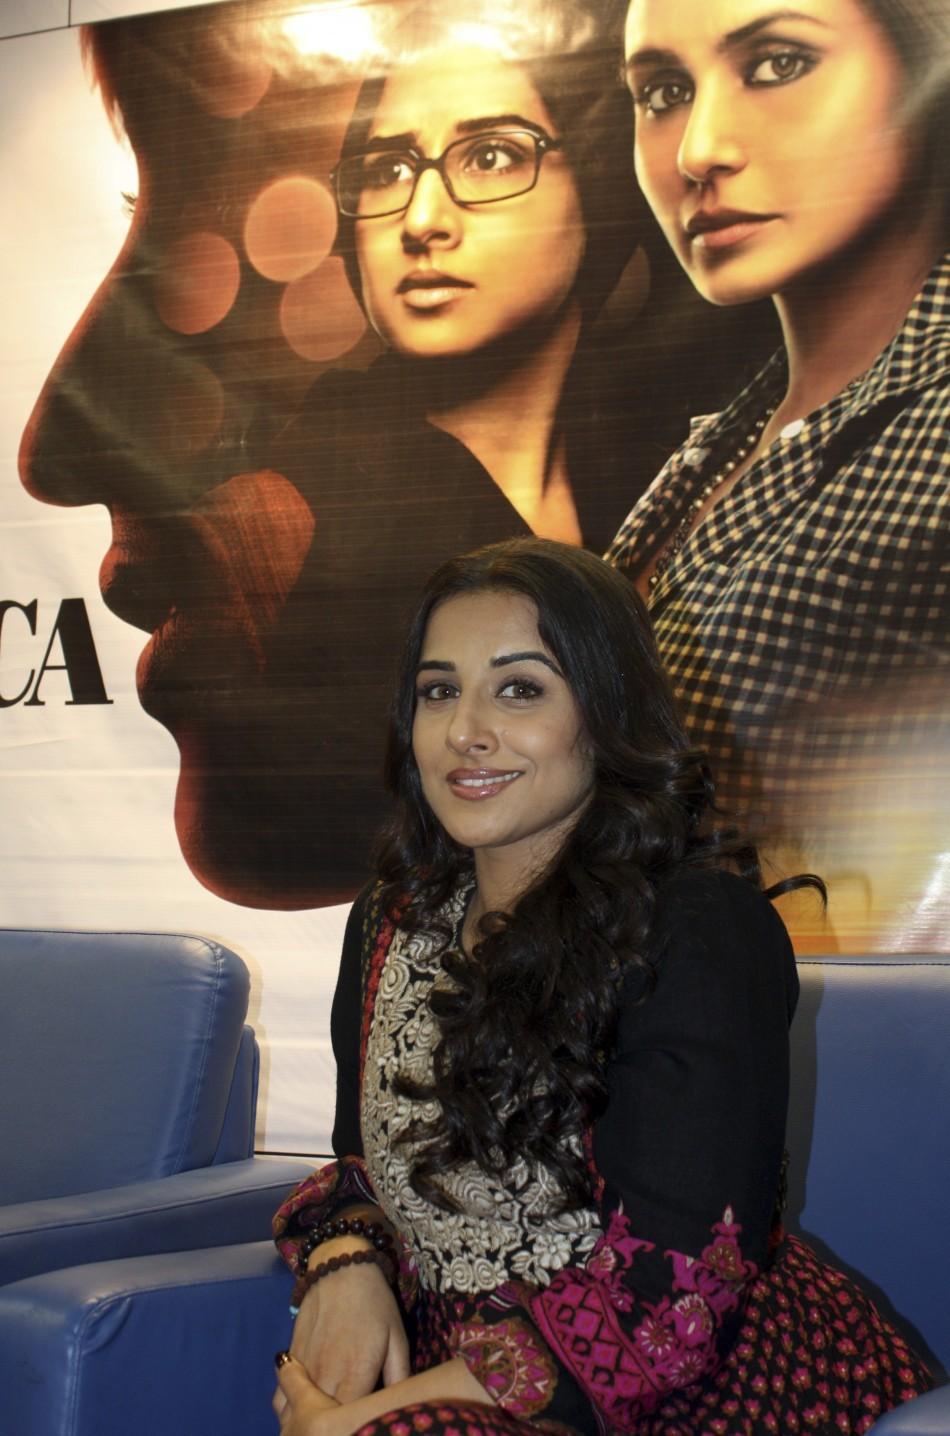 Vidya' Journey to Stardom